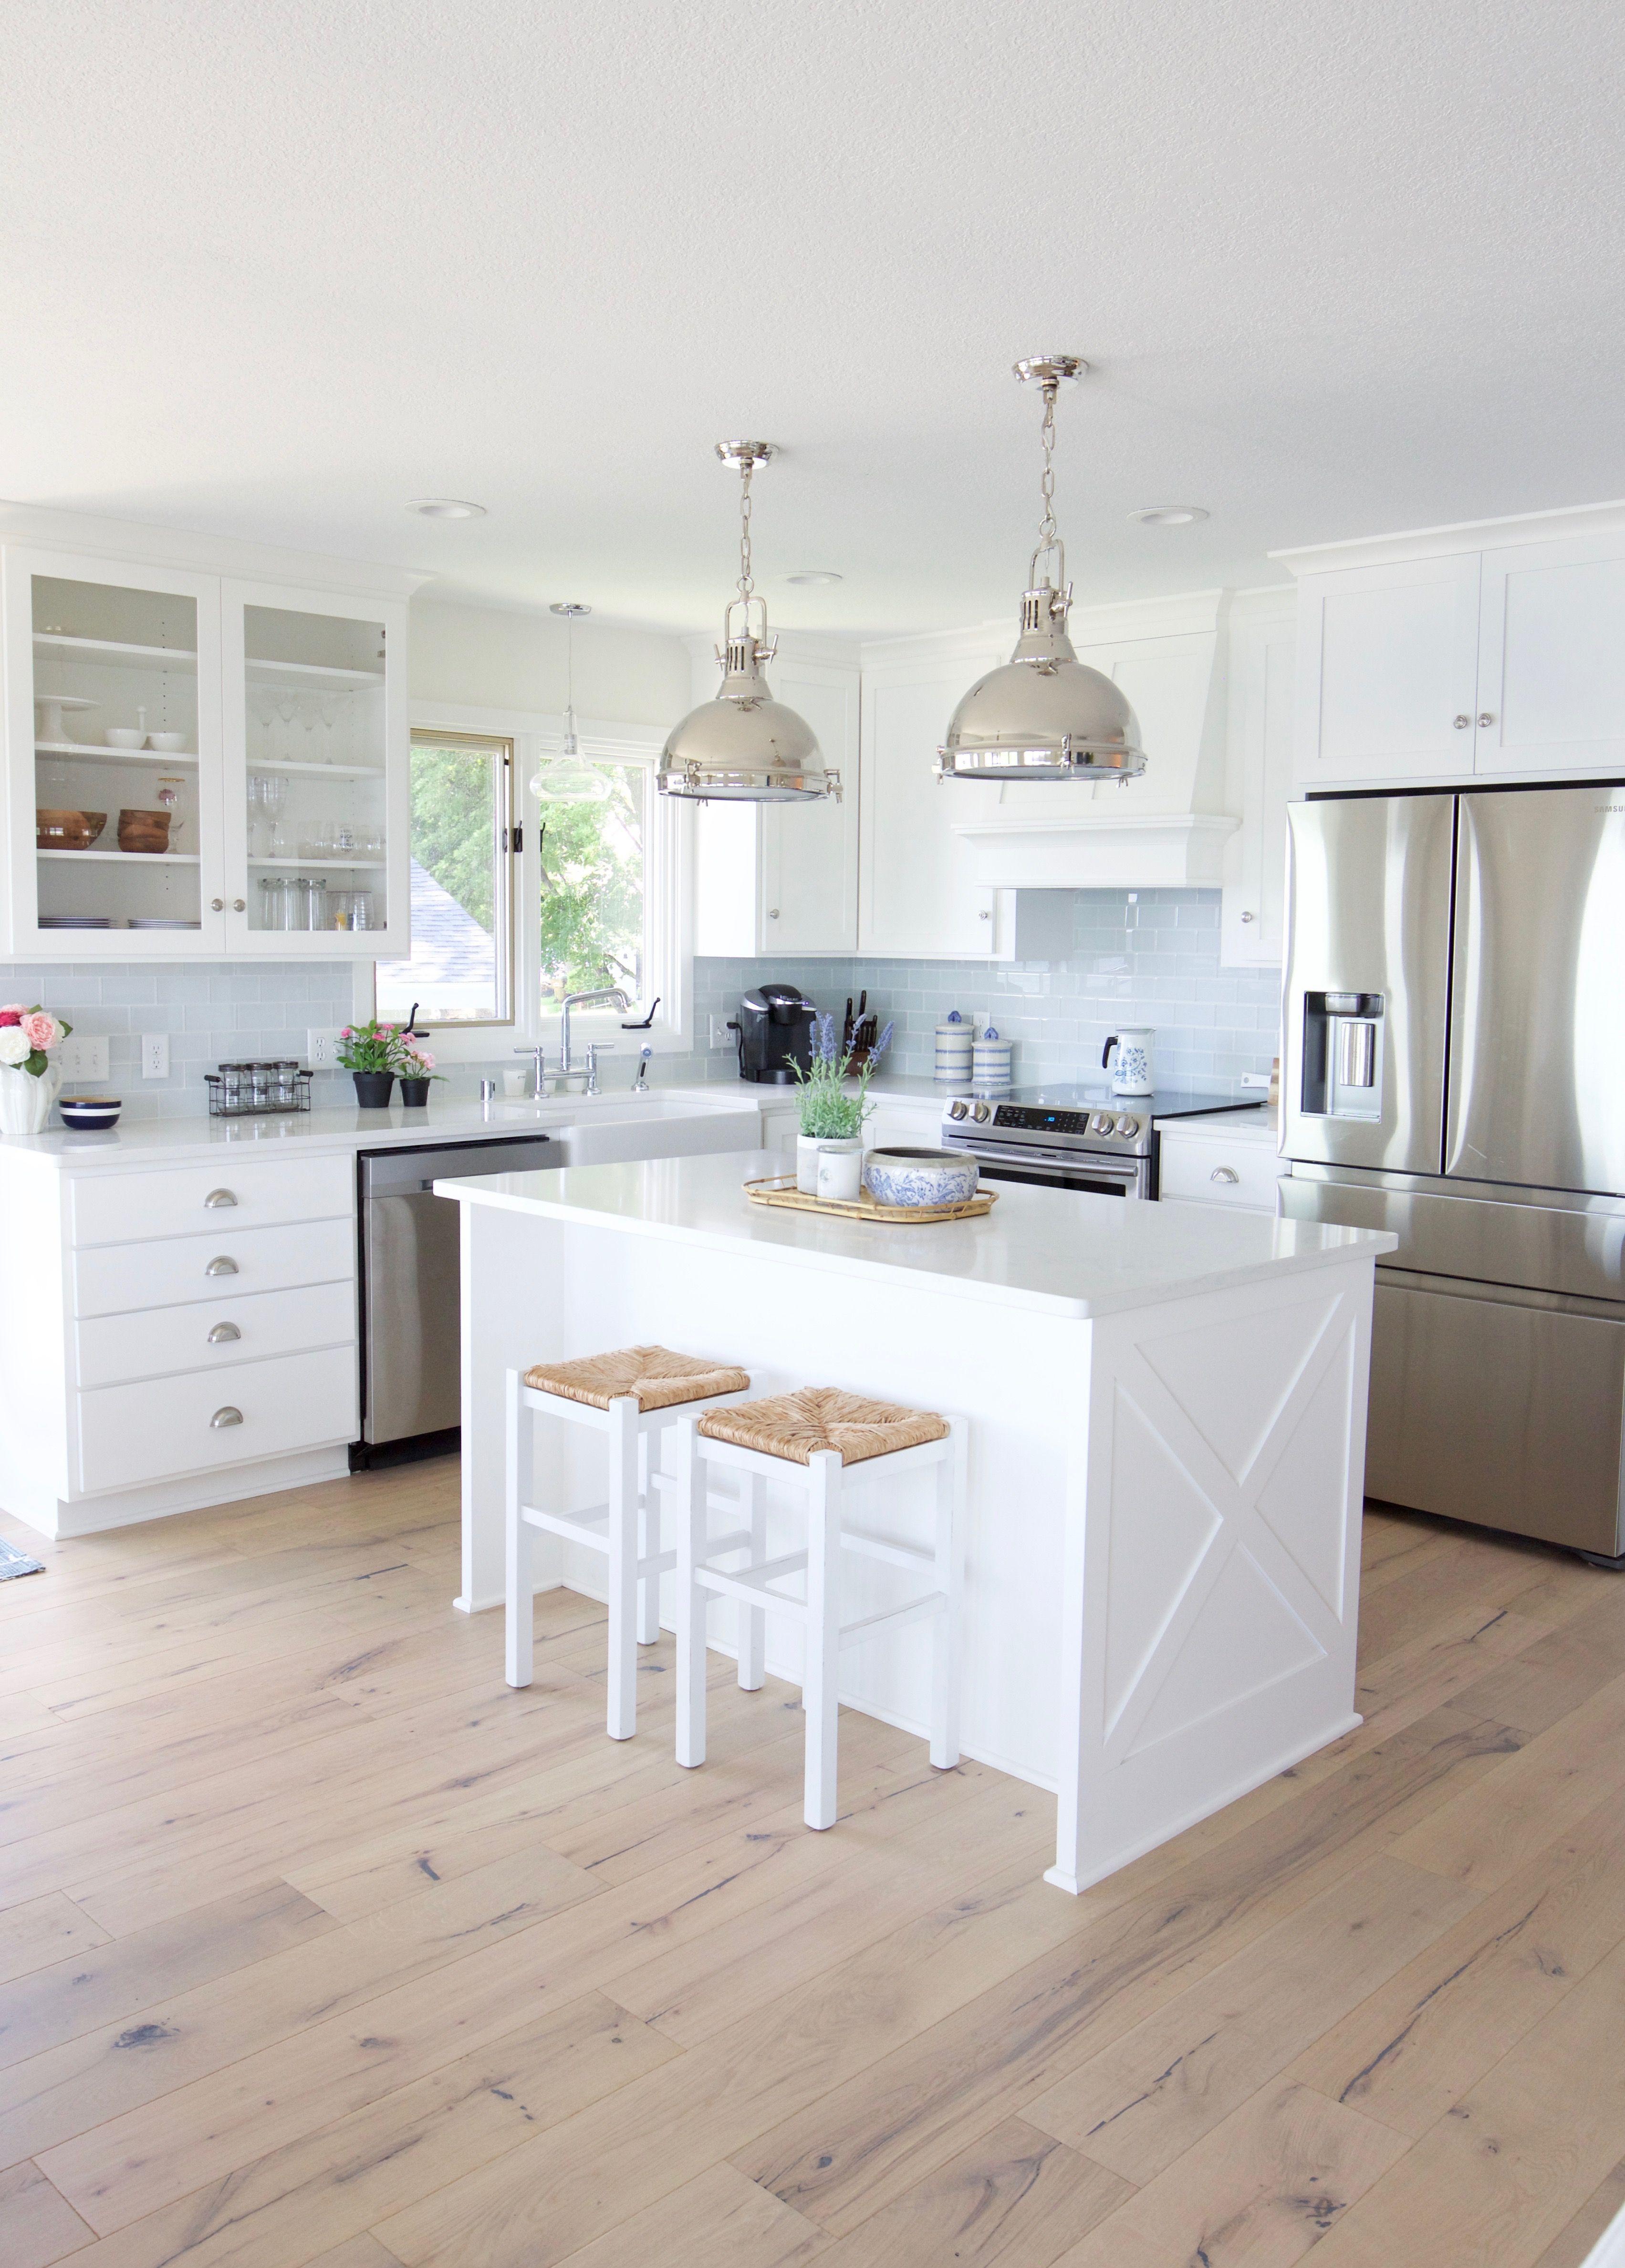 Find More Ideas Home Kitchen Improvement Decor Ideas Home